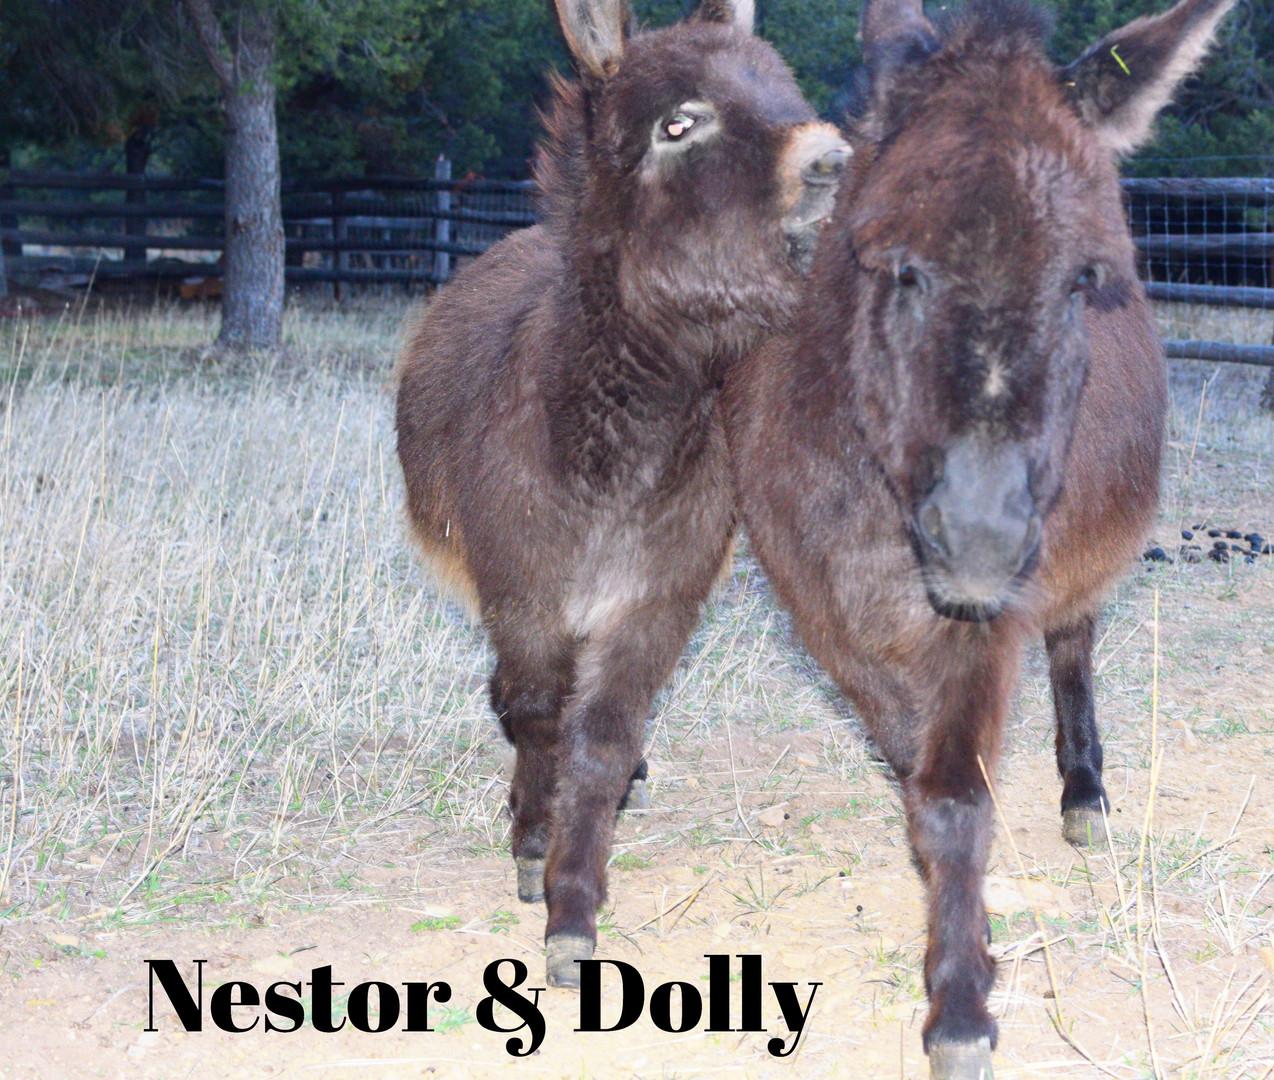 Nestor & Dolly